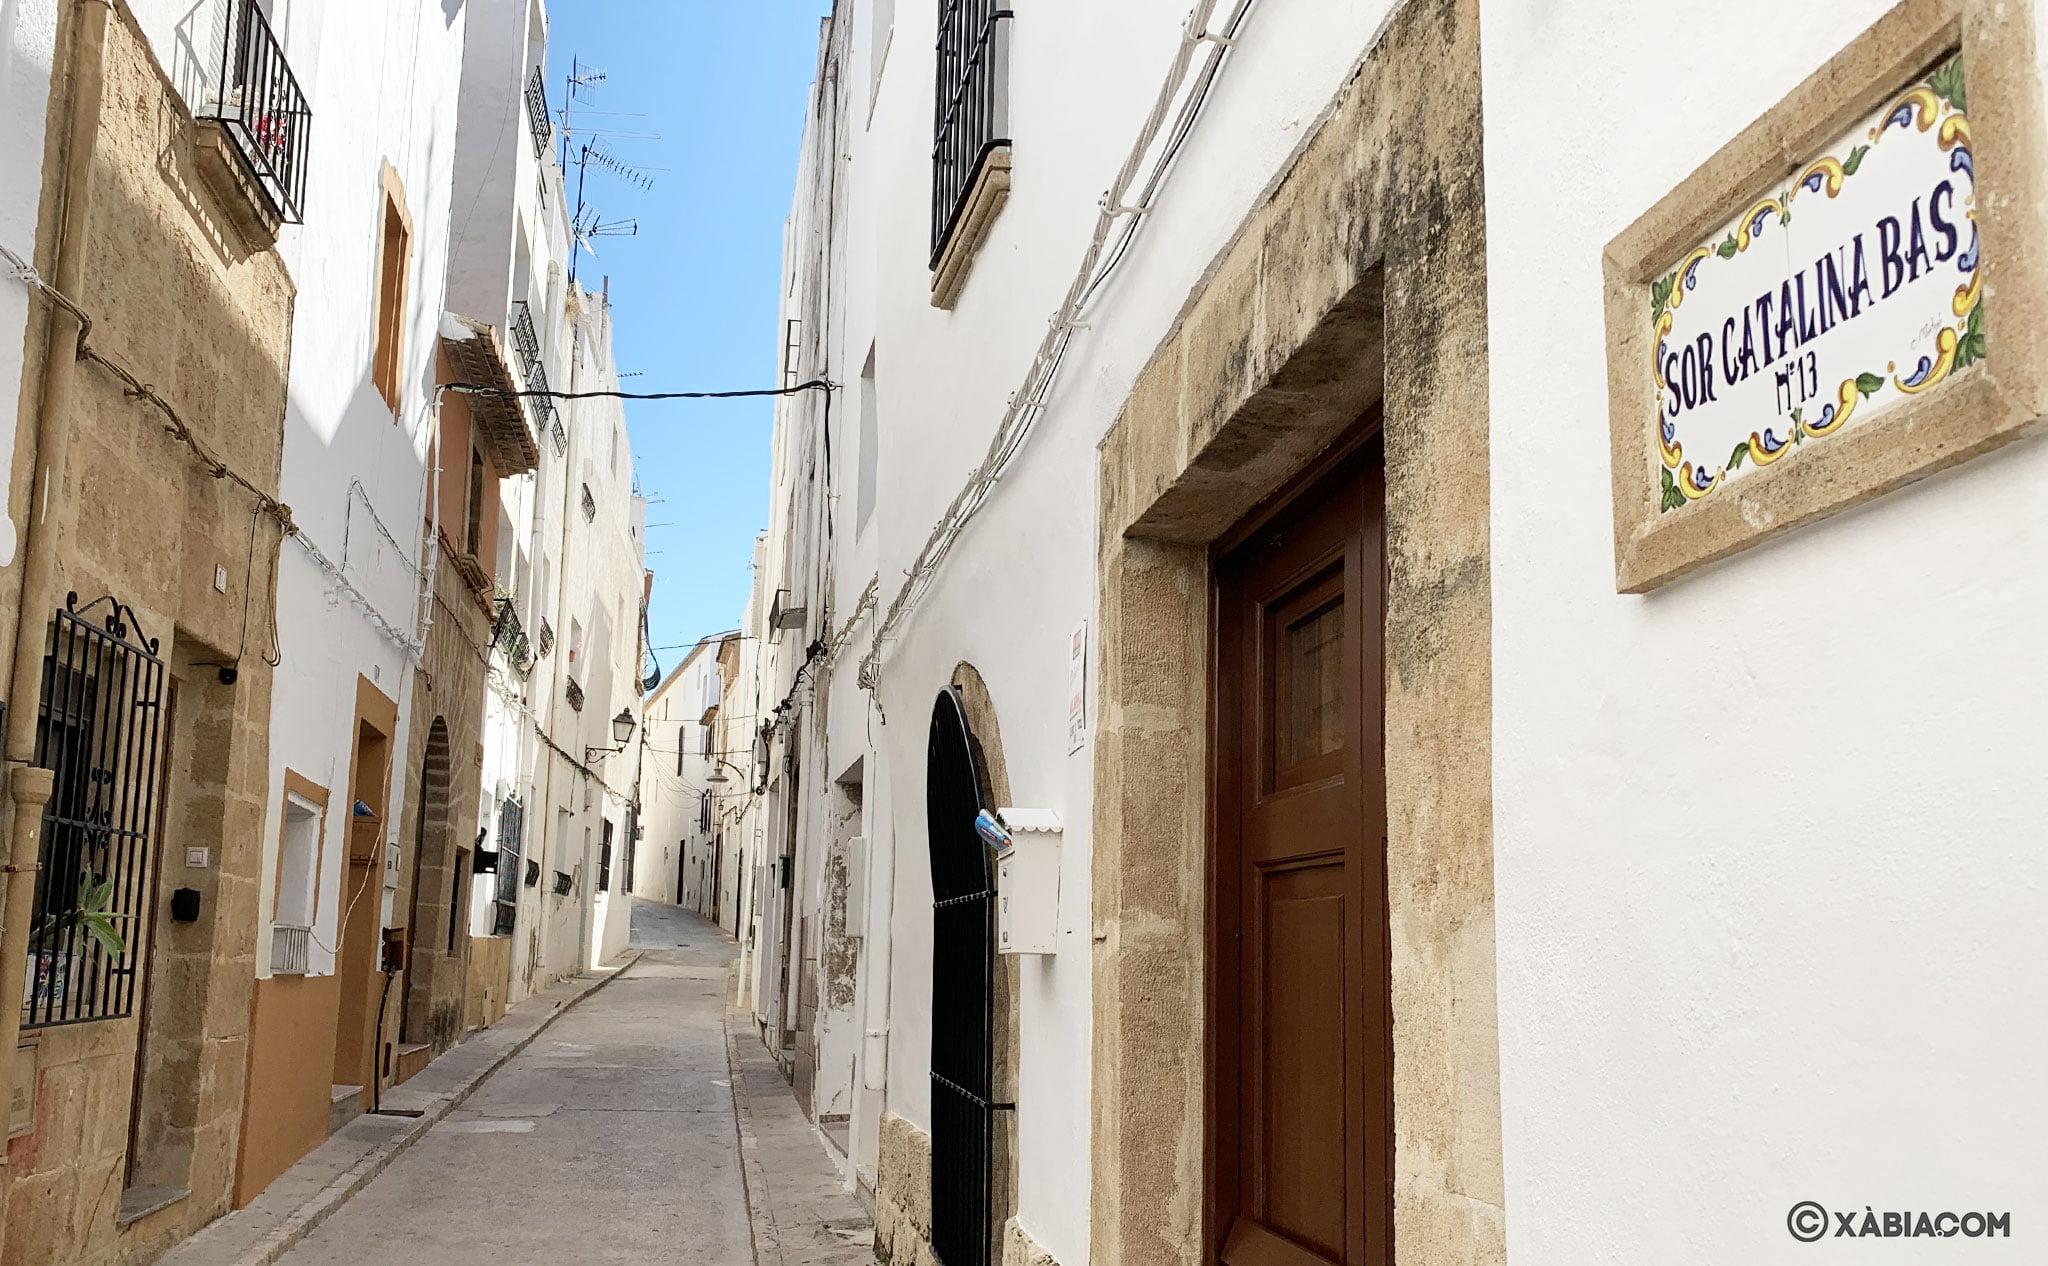 Vista general de la calle Sor Caterina Bas de Xàbia